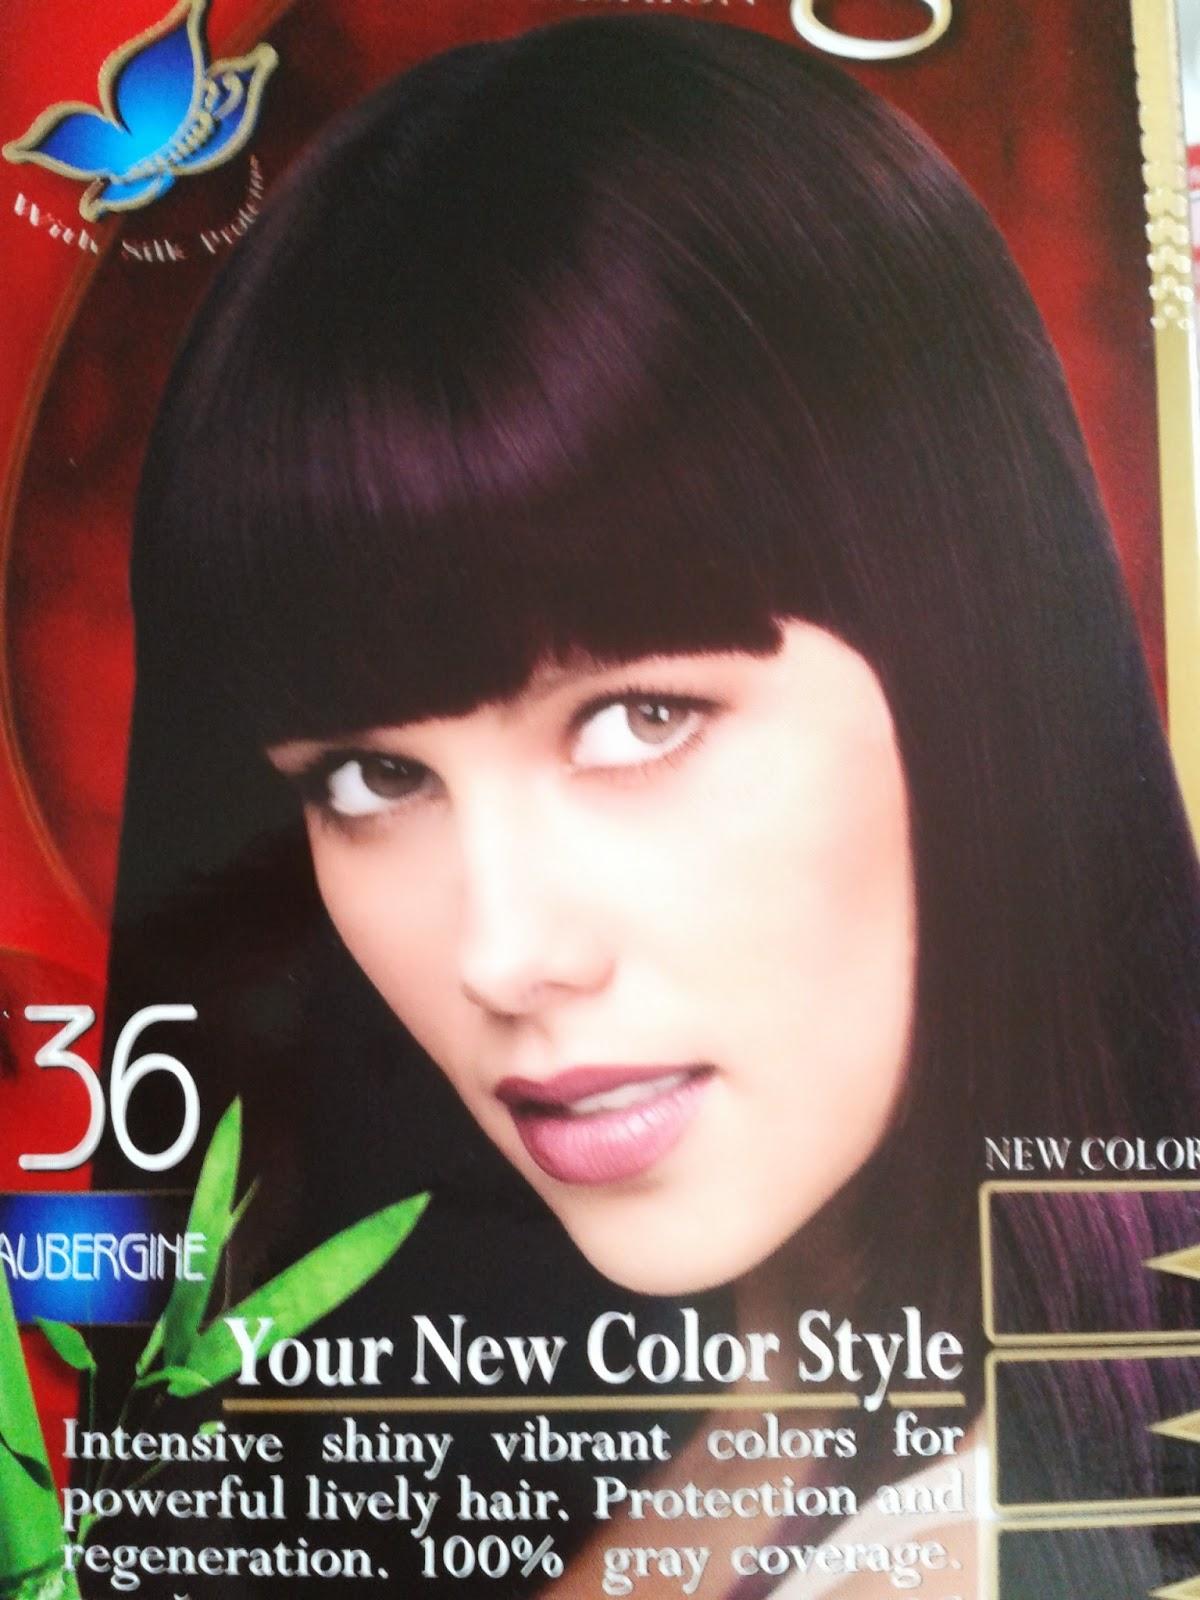 visage n 36 aubergine - Coloration Aubergine